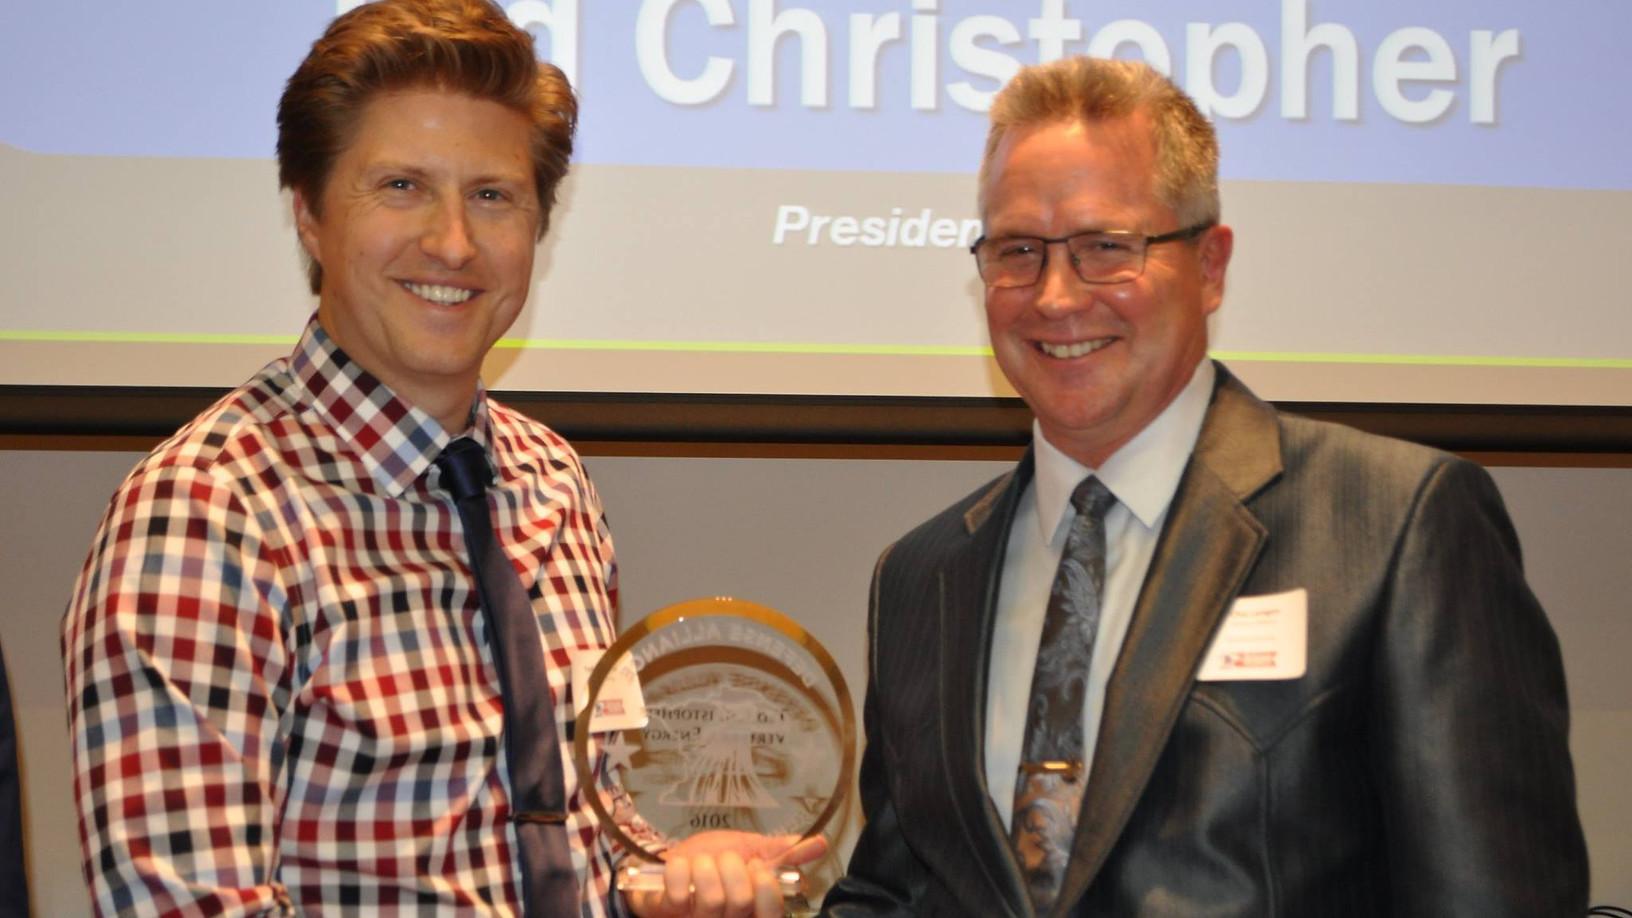 Architect of Defense Award